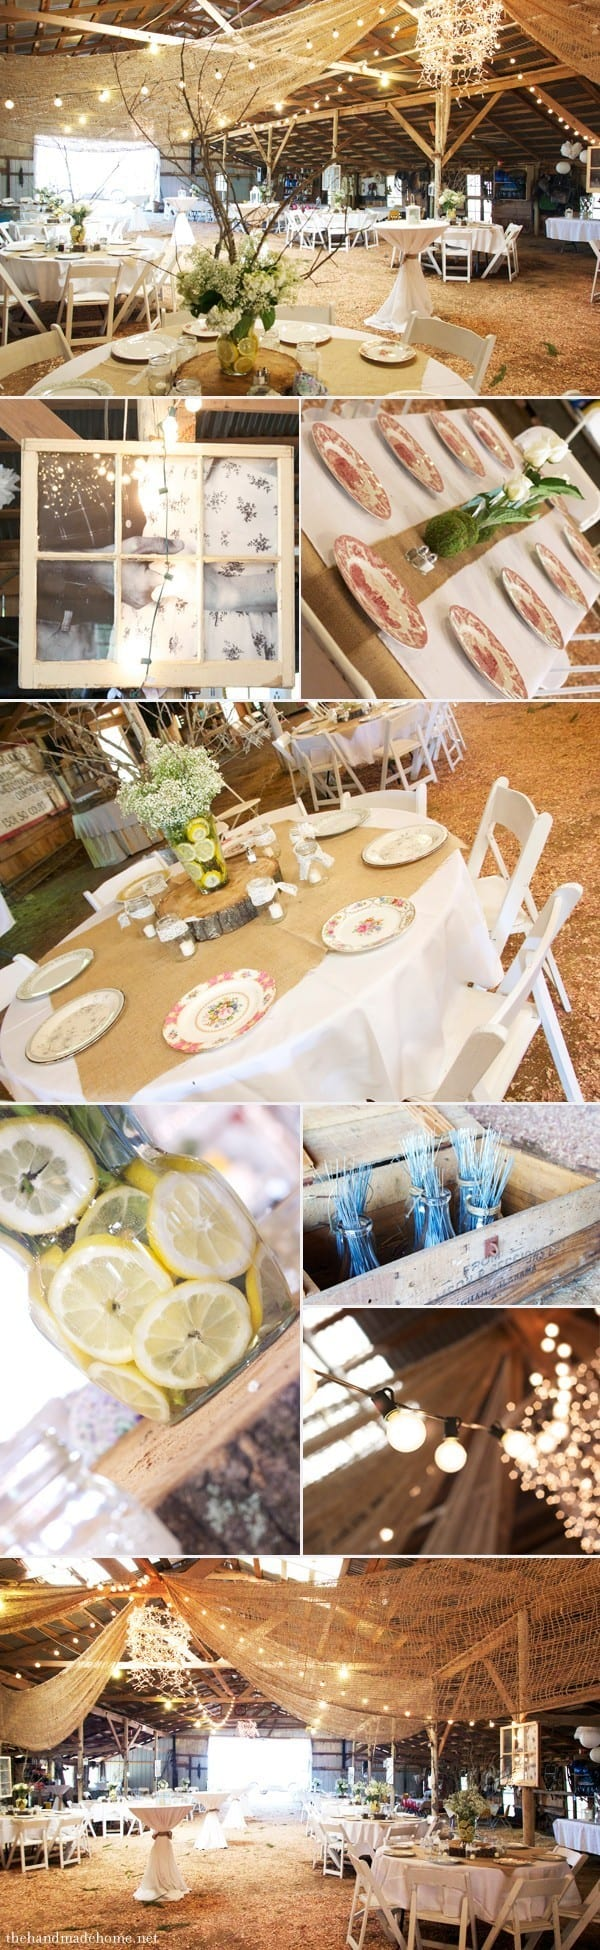 barn_wedding